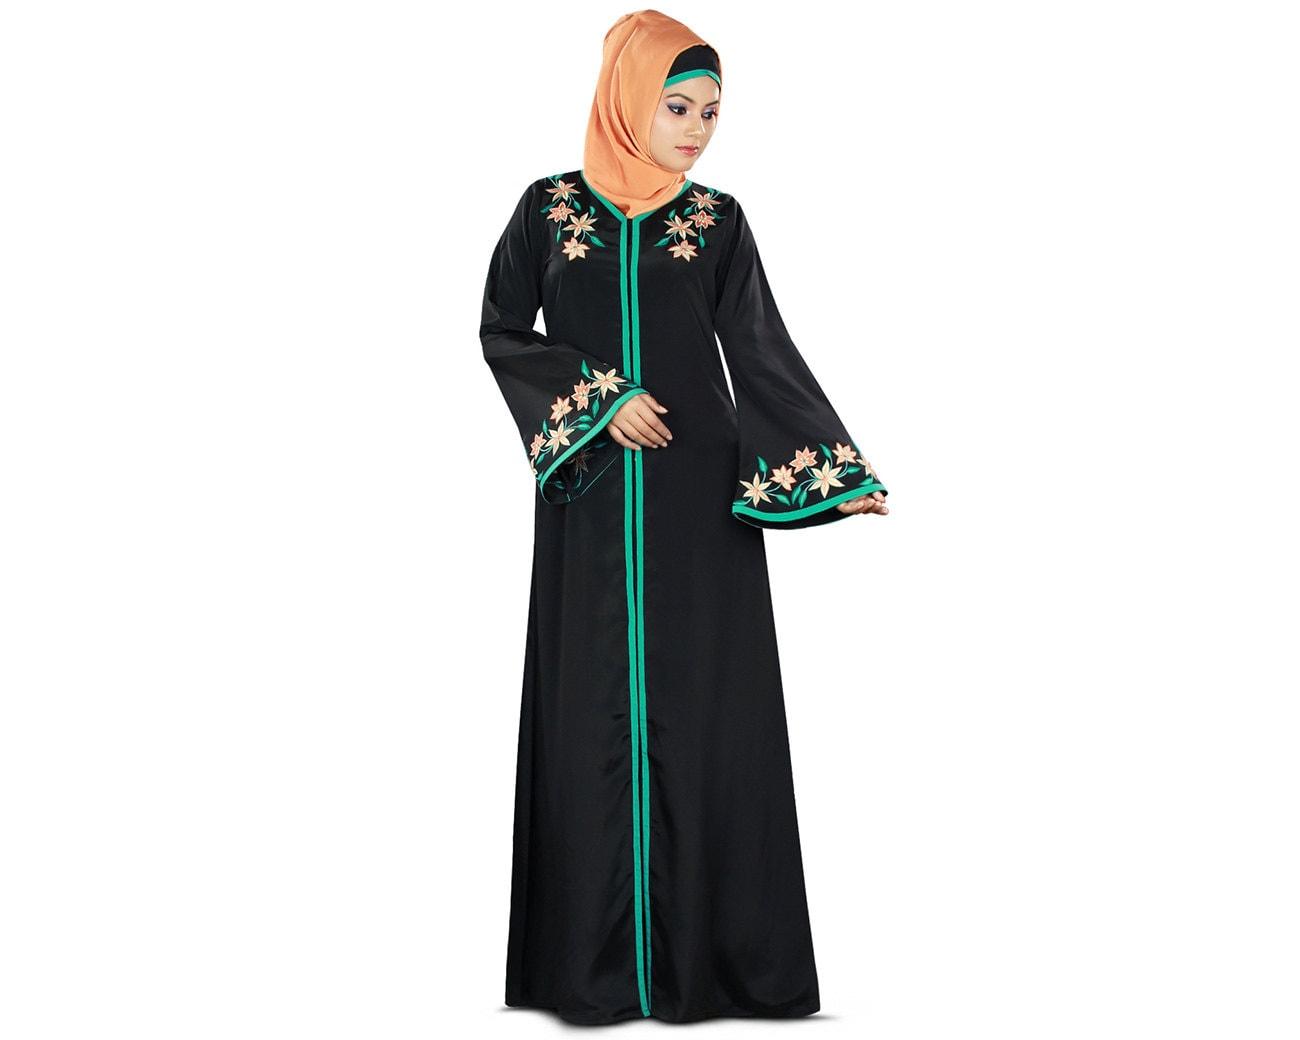 Evening dress images yoda